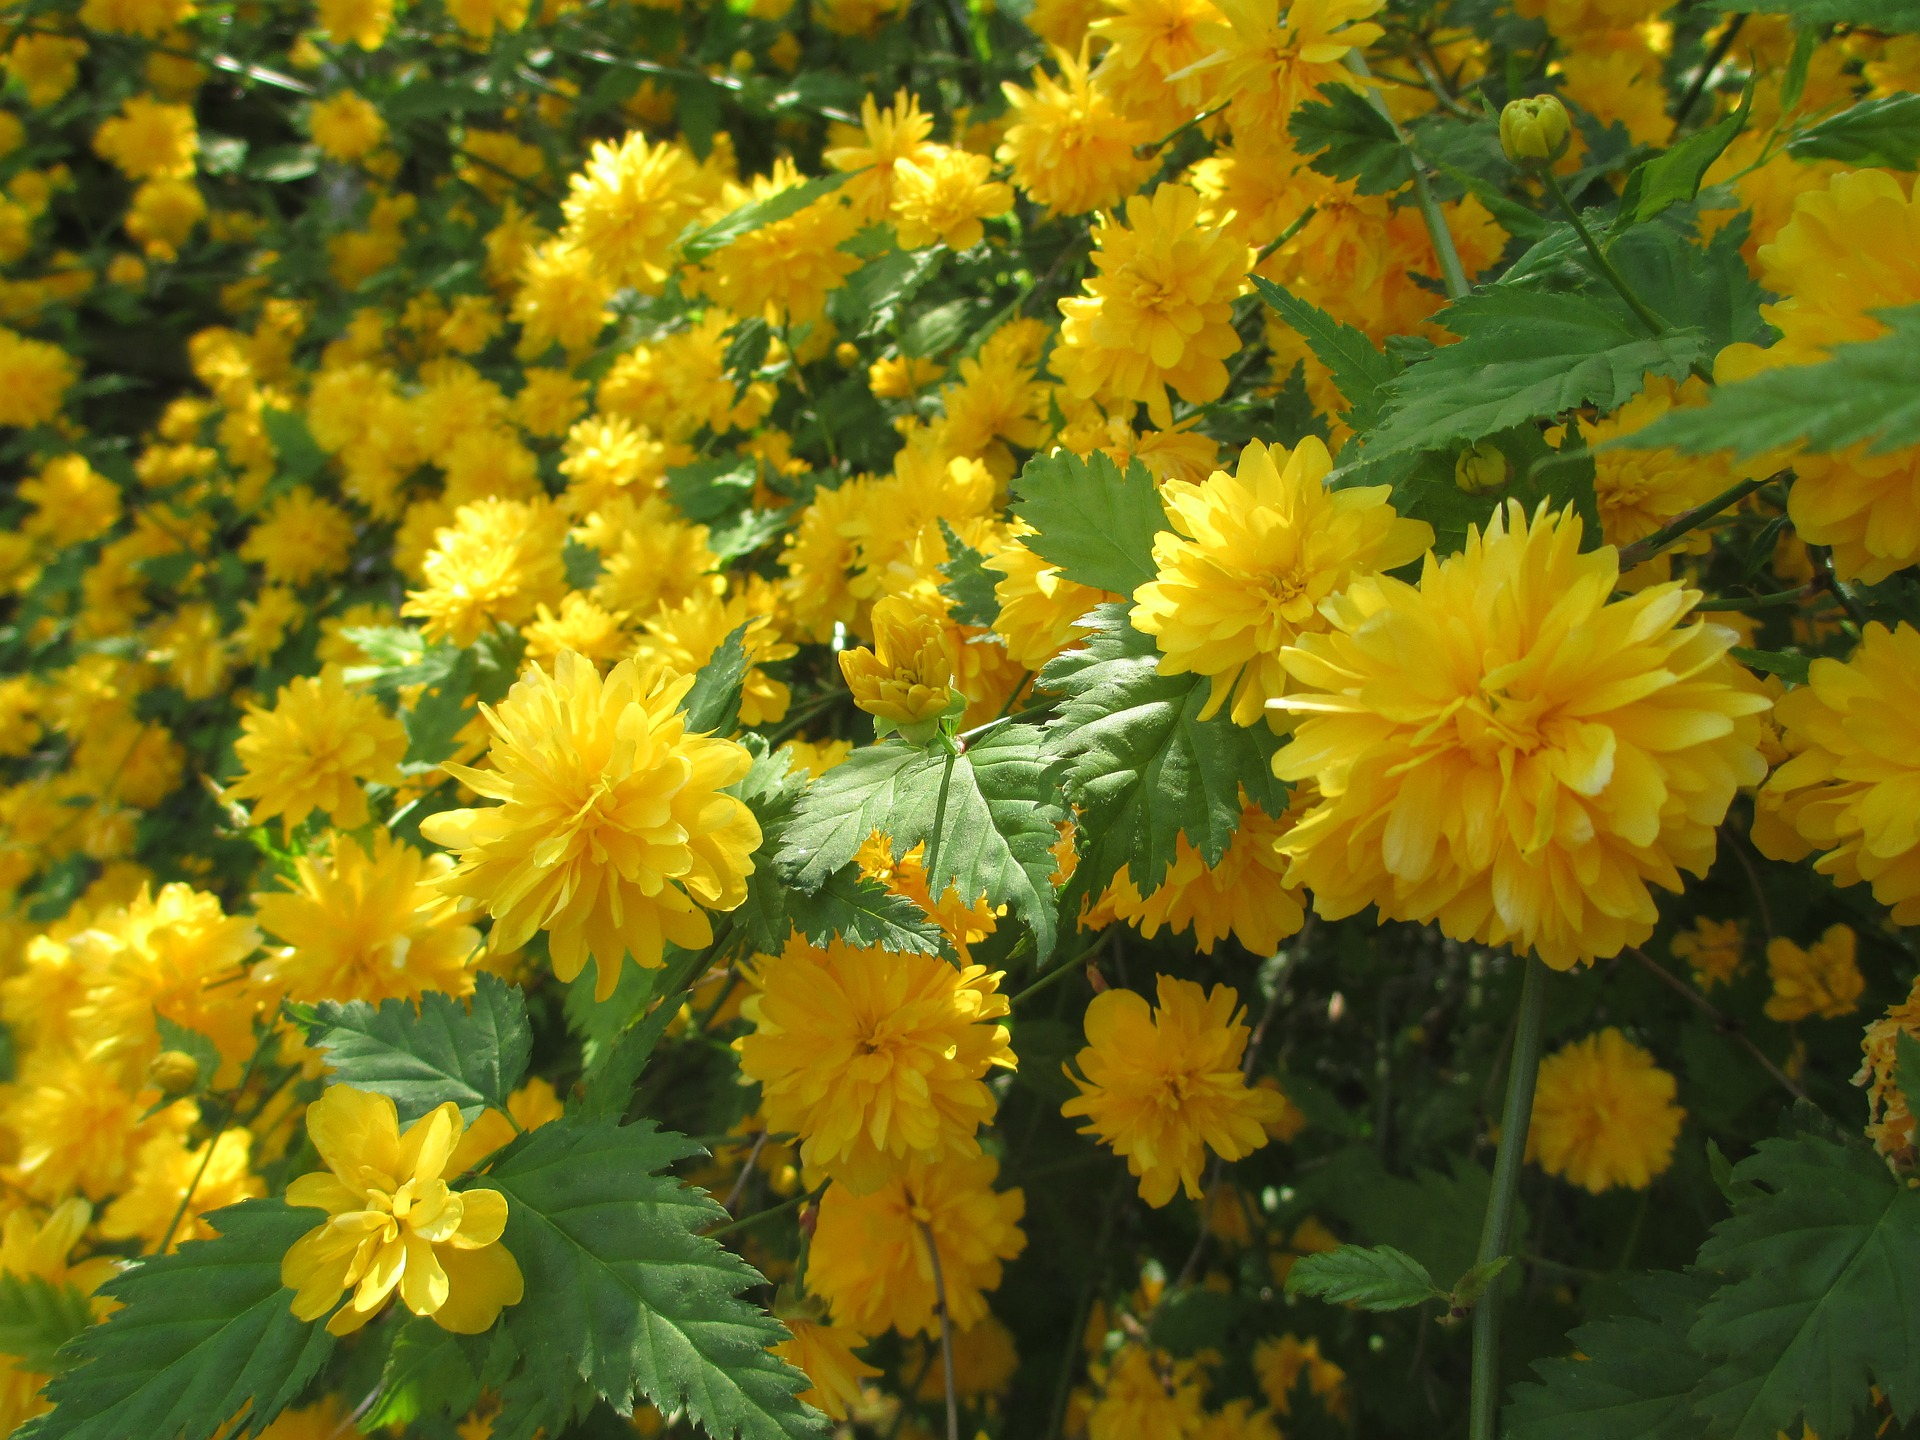 صور صور ورد اصفر , خلفيات ورد اصفر للكمبيوتر